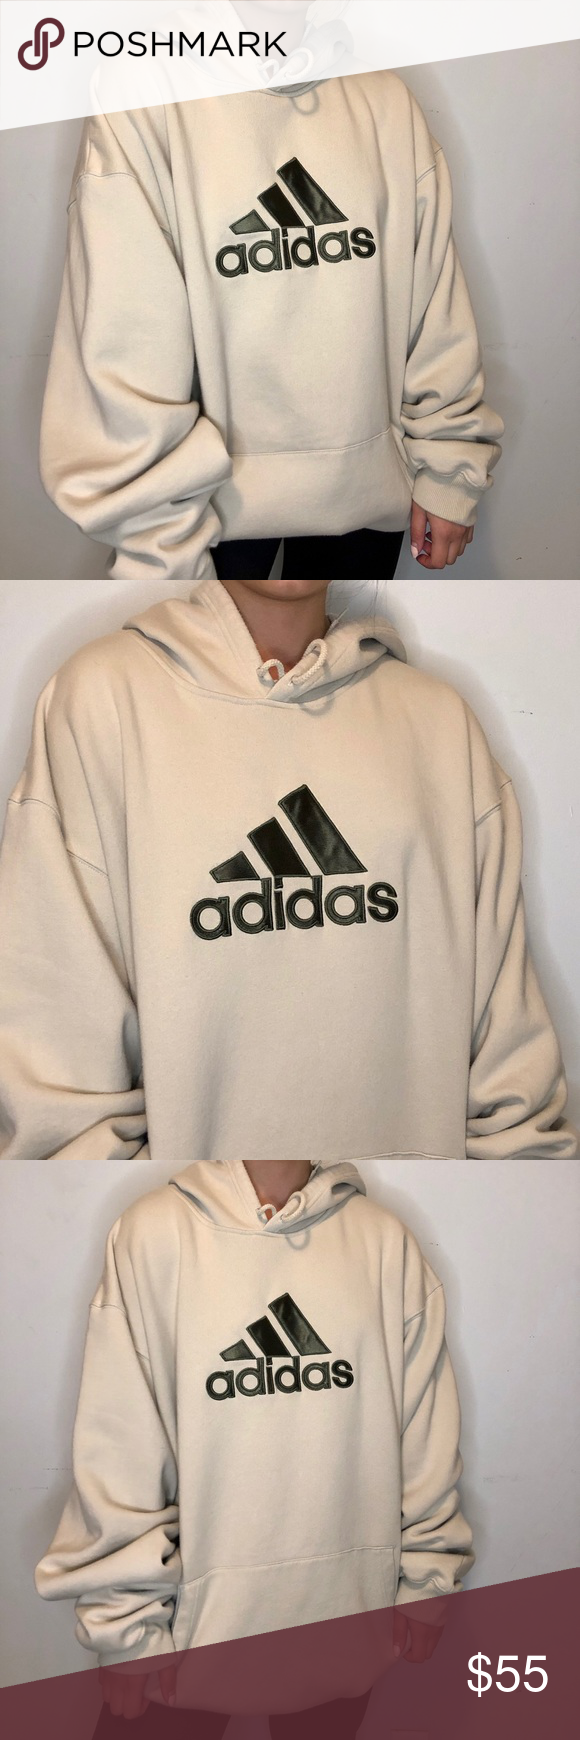 Vintage Adidas Cream Trefoil Hoodie Vintage Adidas Cream Trefoil Hoodie Long Sleeve Sweater With Black Graphi Vintage Adidas Adidas Sweater Long Sleeve Sweater [ 1740 x 580 Pixel ]